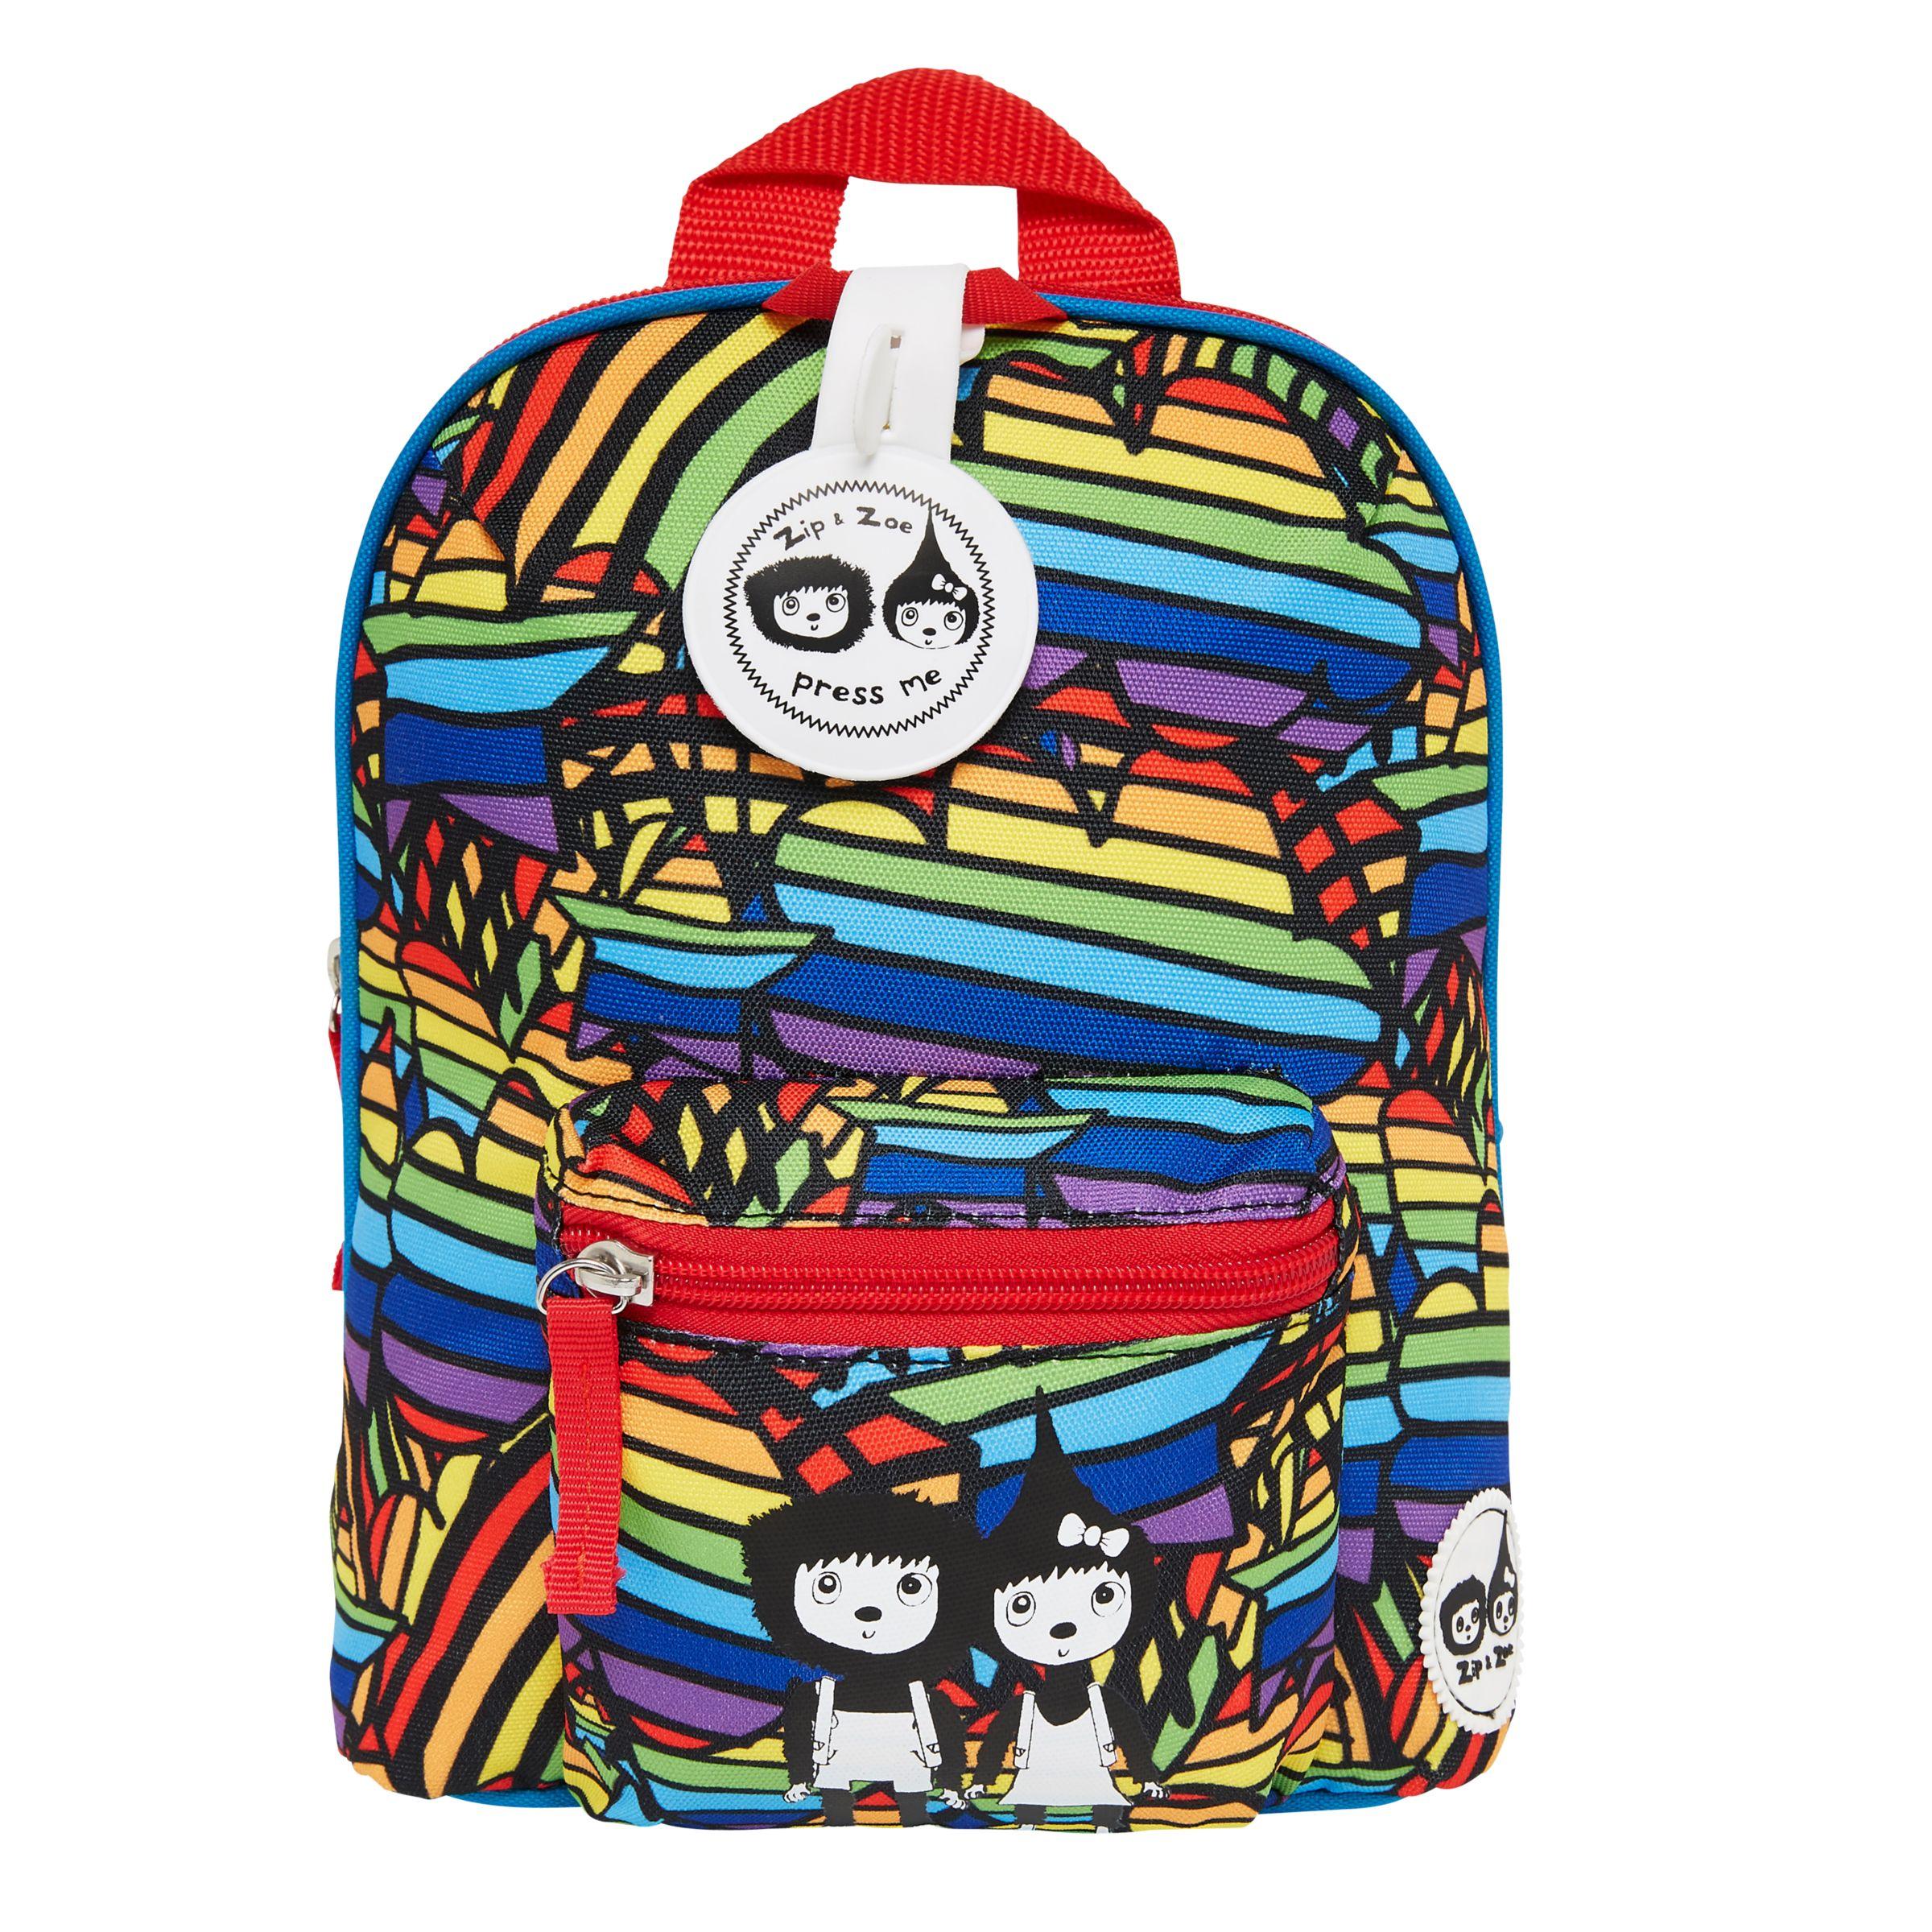 Babymel Babymel Zip & Zoe Mini Bag, Reins and Safety Harness, Rainbow Multi